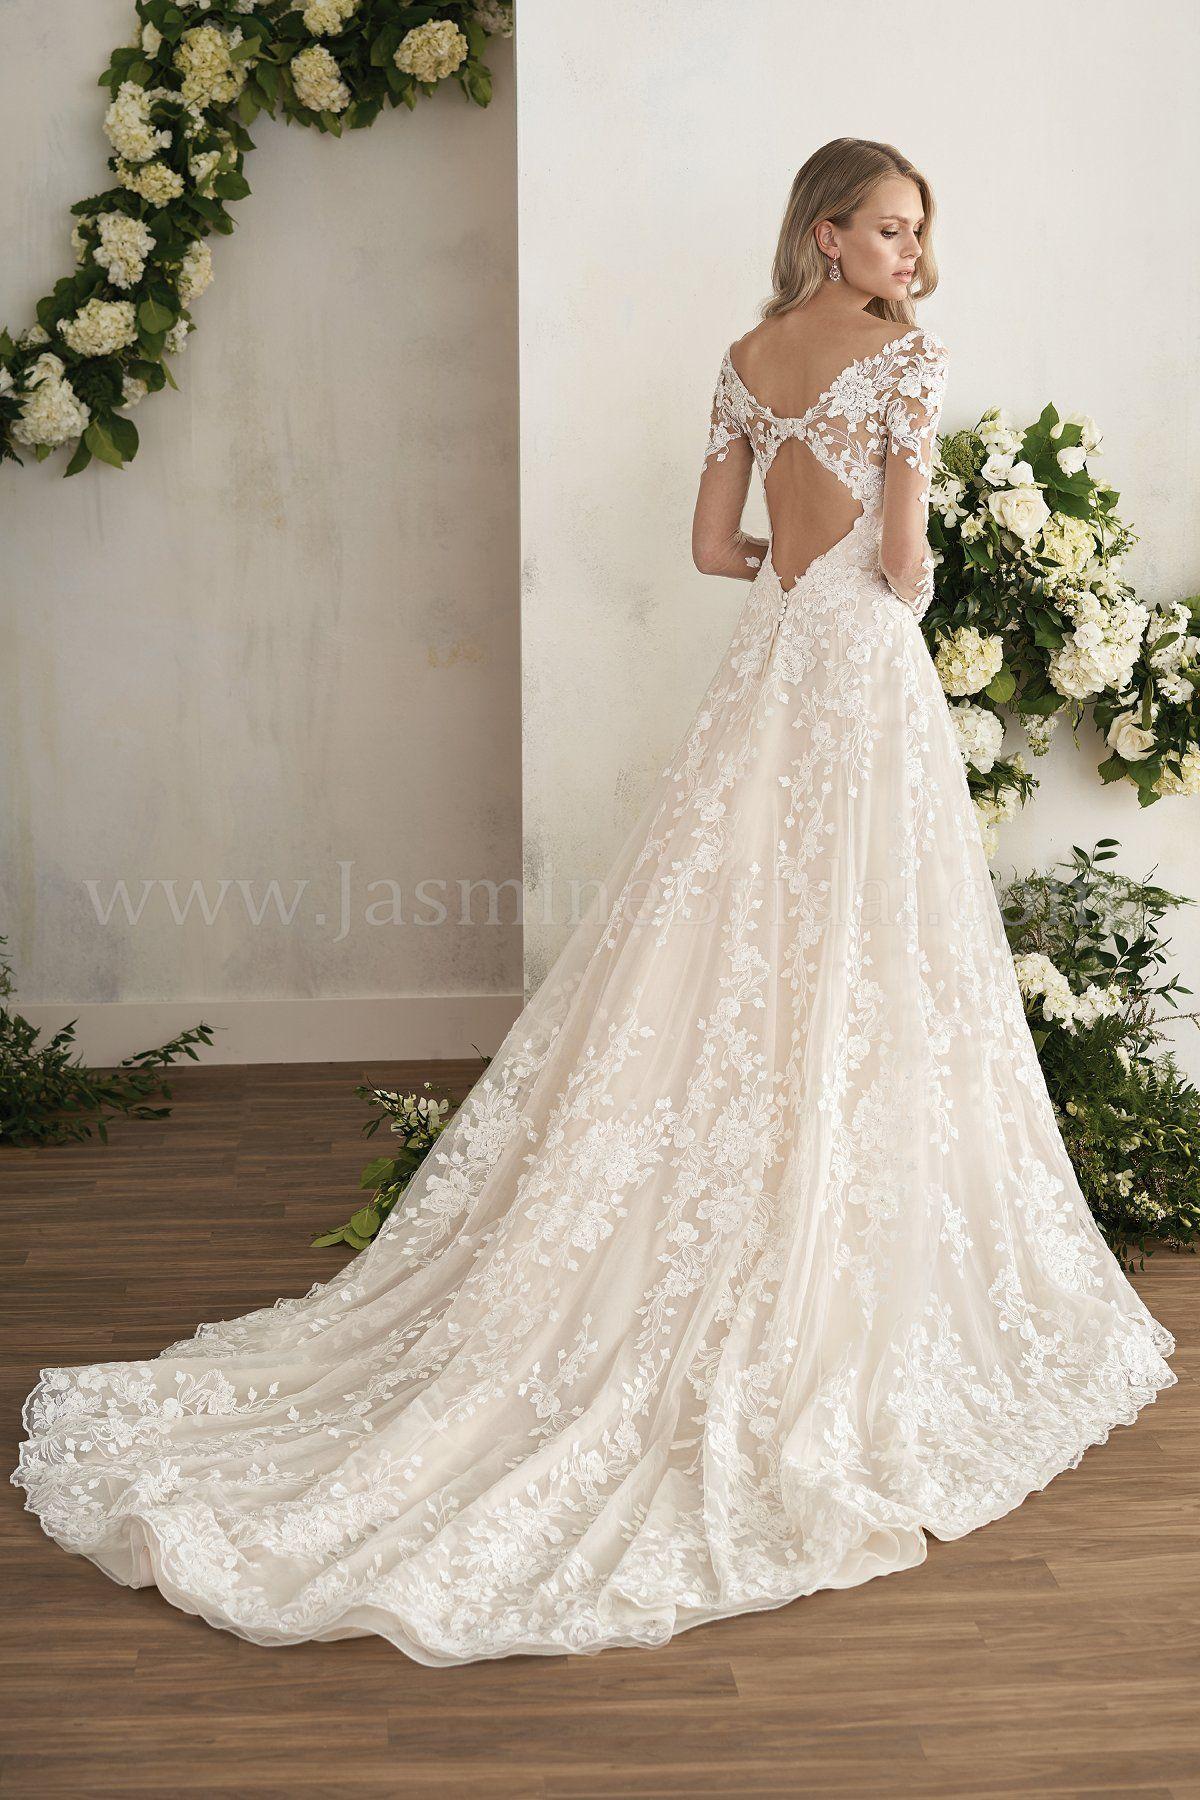 Jasmine Bridal Winter Wedding Dress Lace Wedding Dresses Long Sleeve Wedding Dress Lace